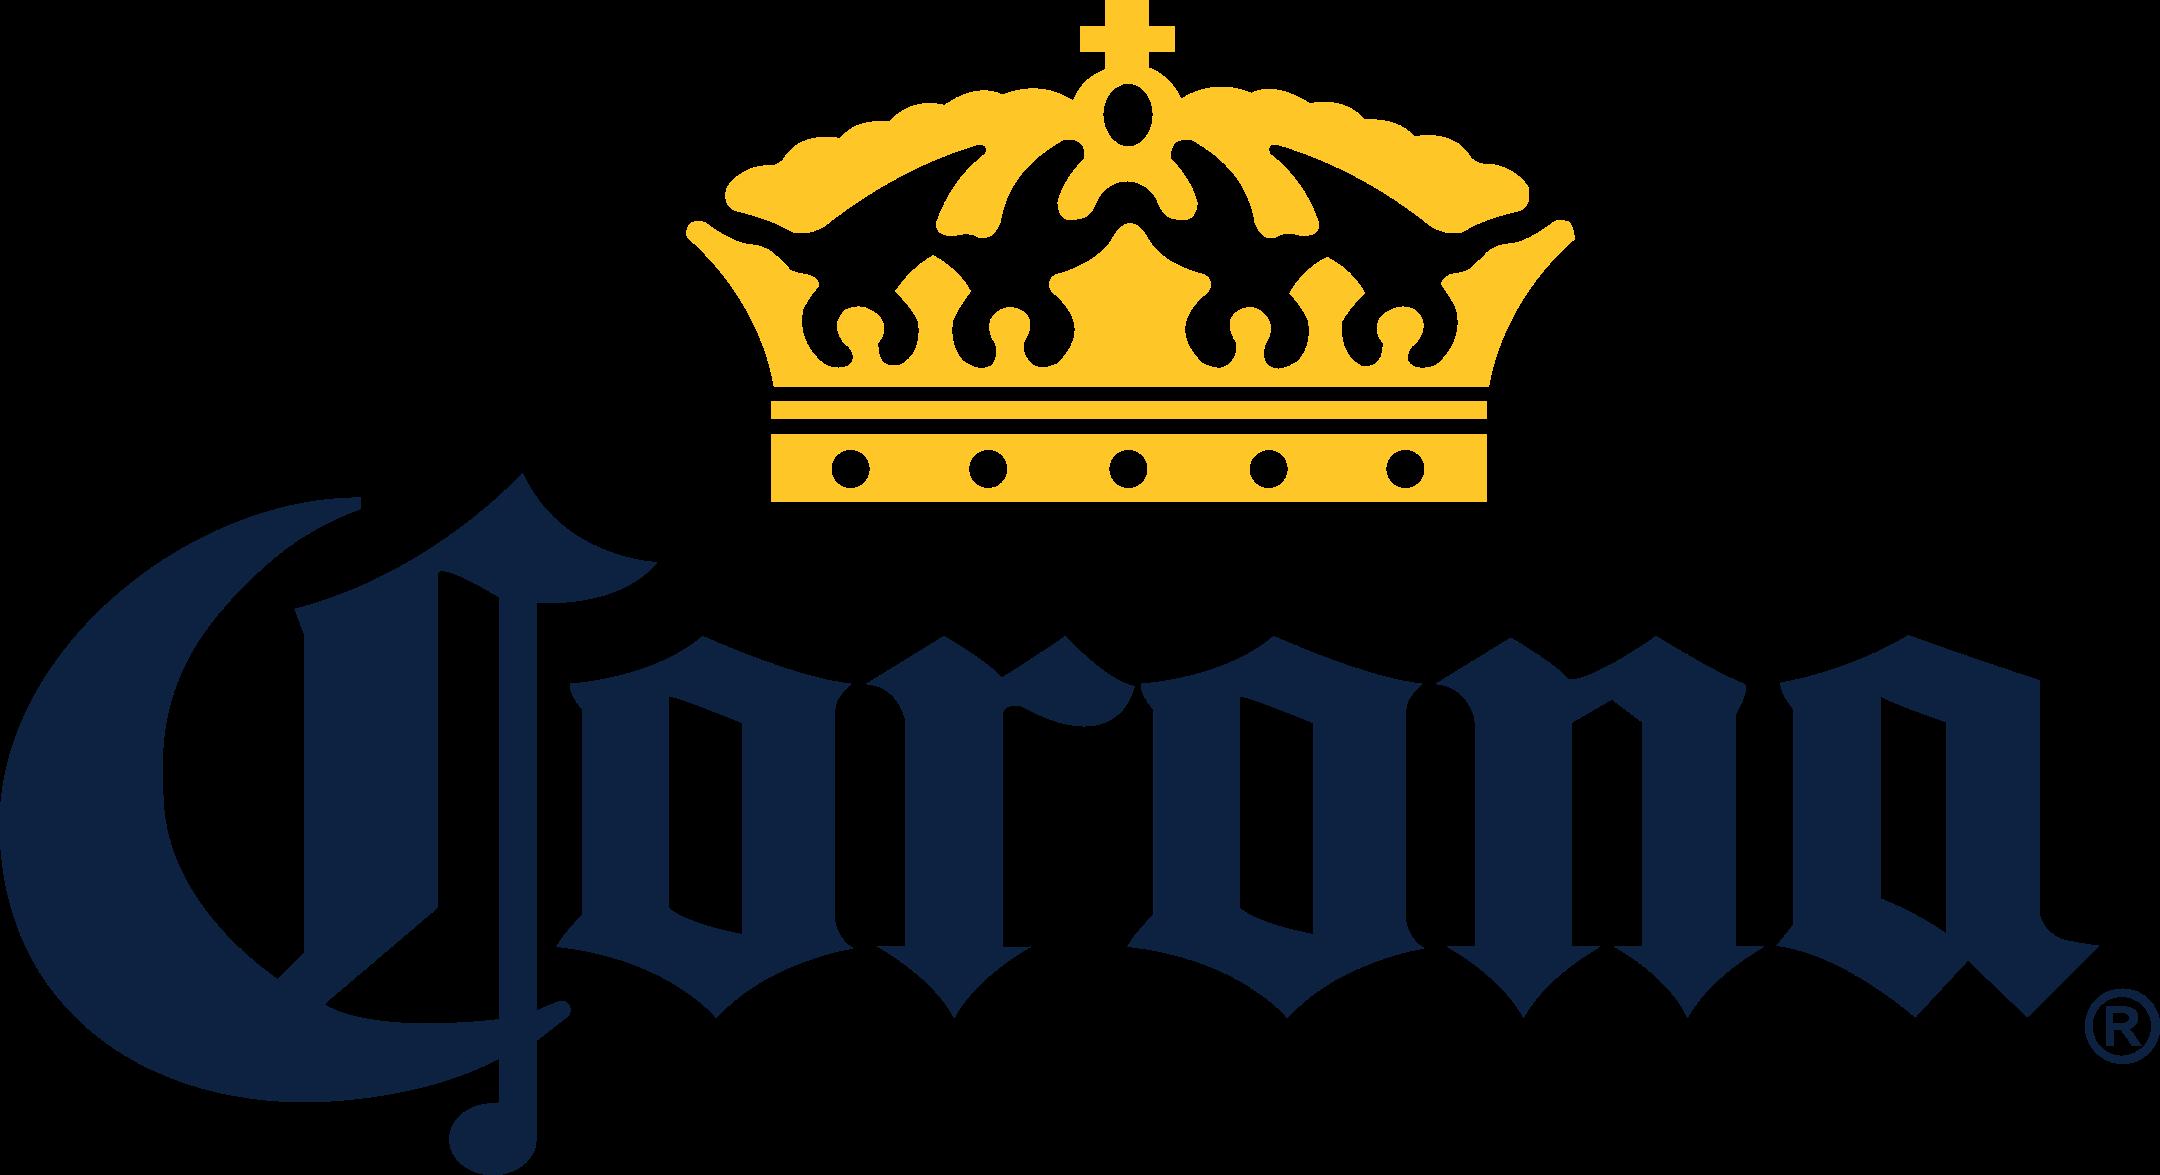 corona logo 1 - Corona Logo